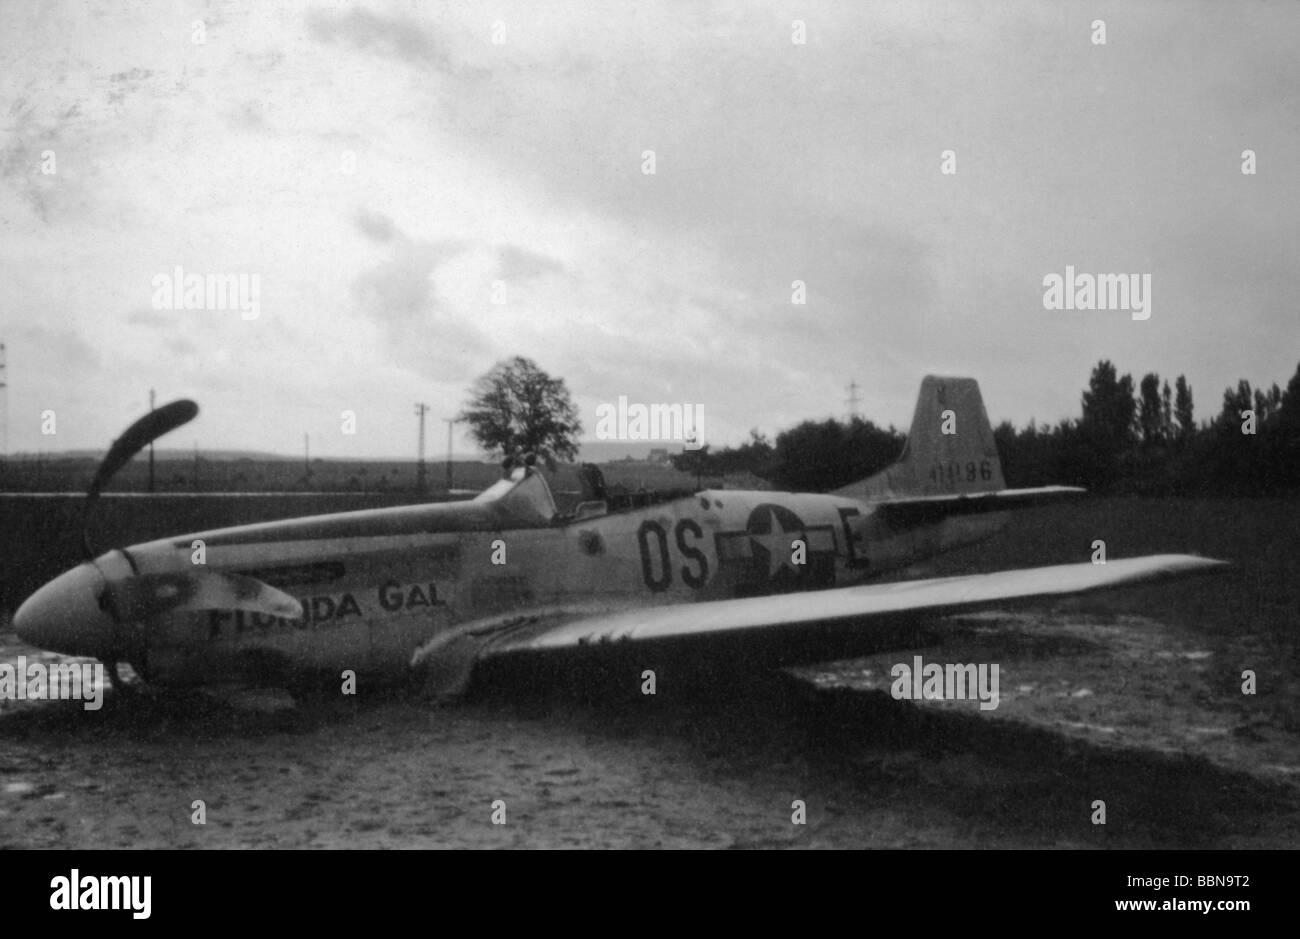 events-second-world-war-wwii-aerial-warfare-aircraft-crashed-damaged-BBN9T2.jpg